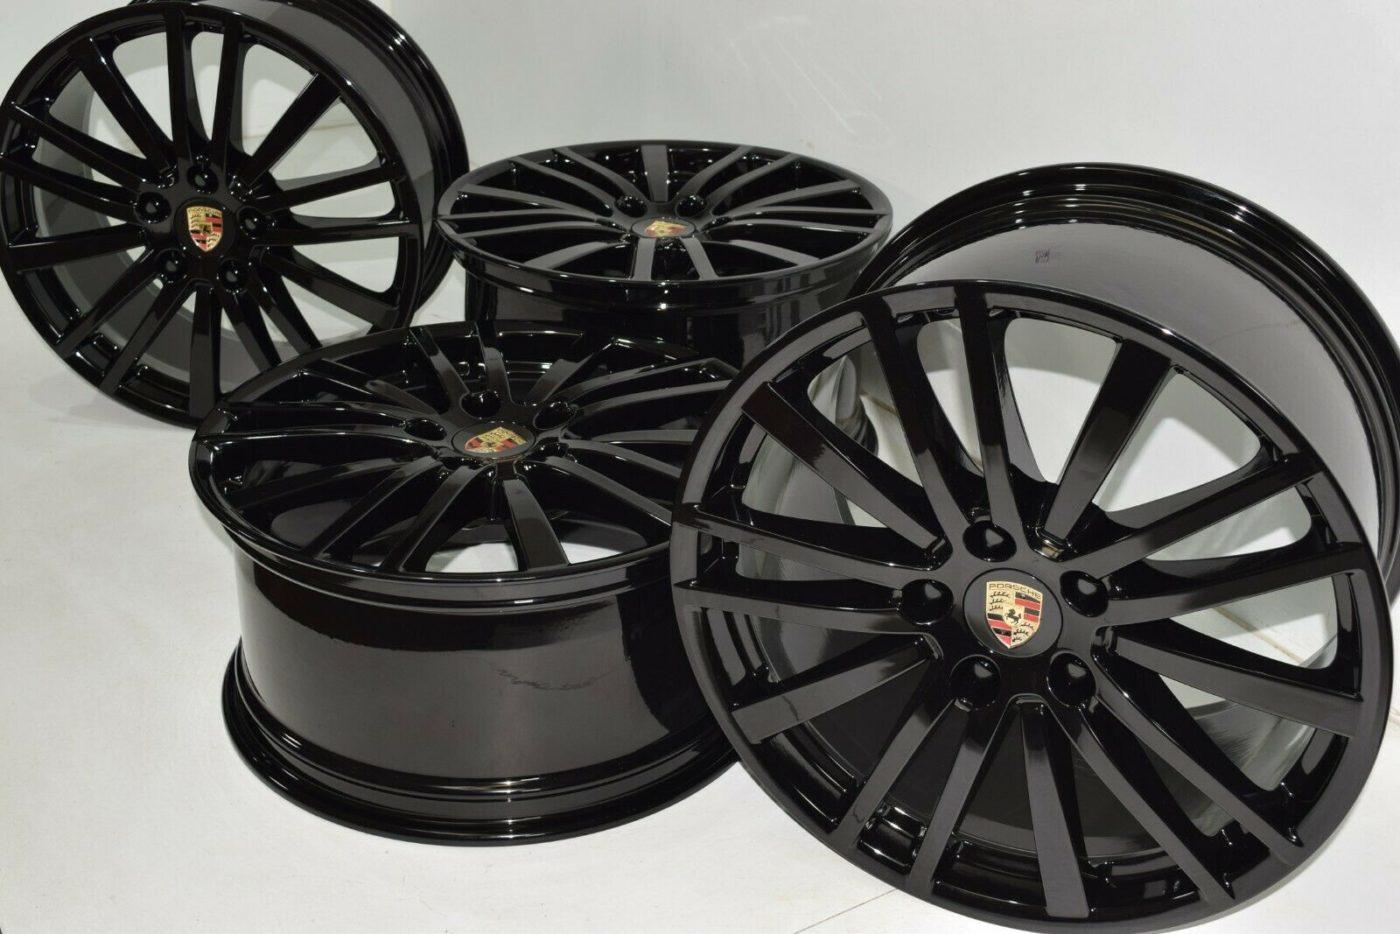 20″ Porsche Panamera Factory OEM Wheels Rims 2018 2019 2020 67498 67499